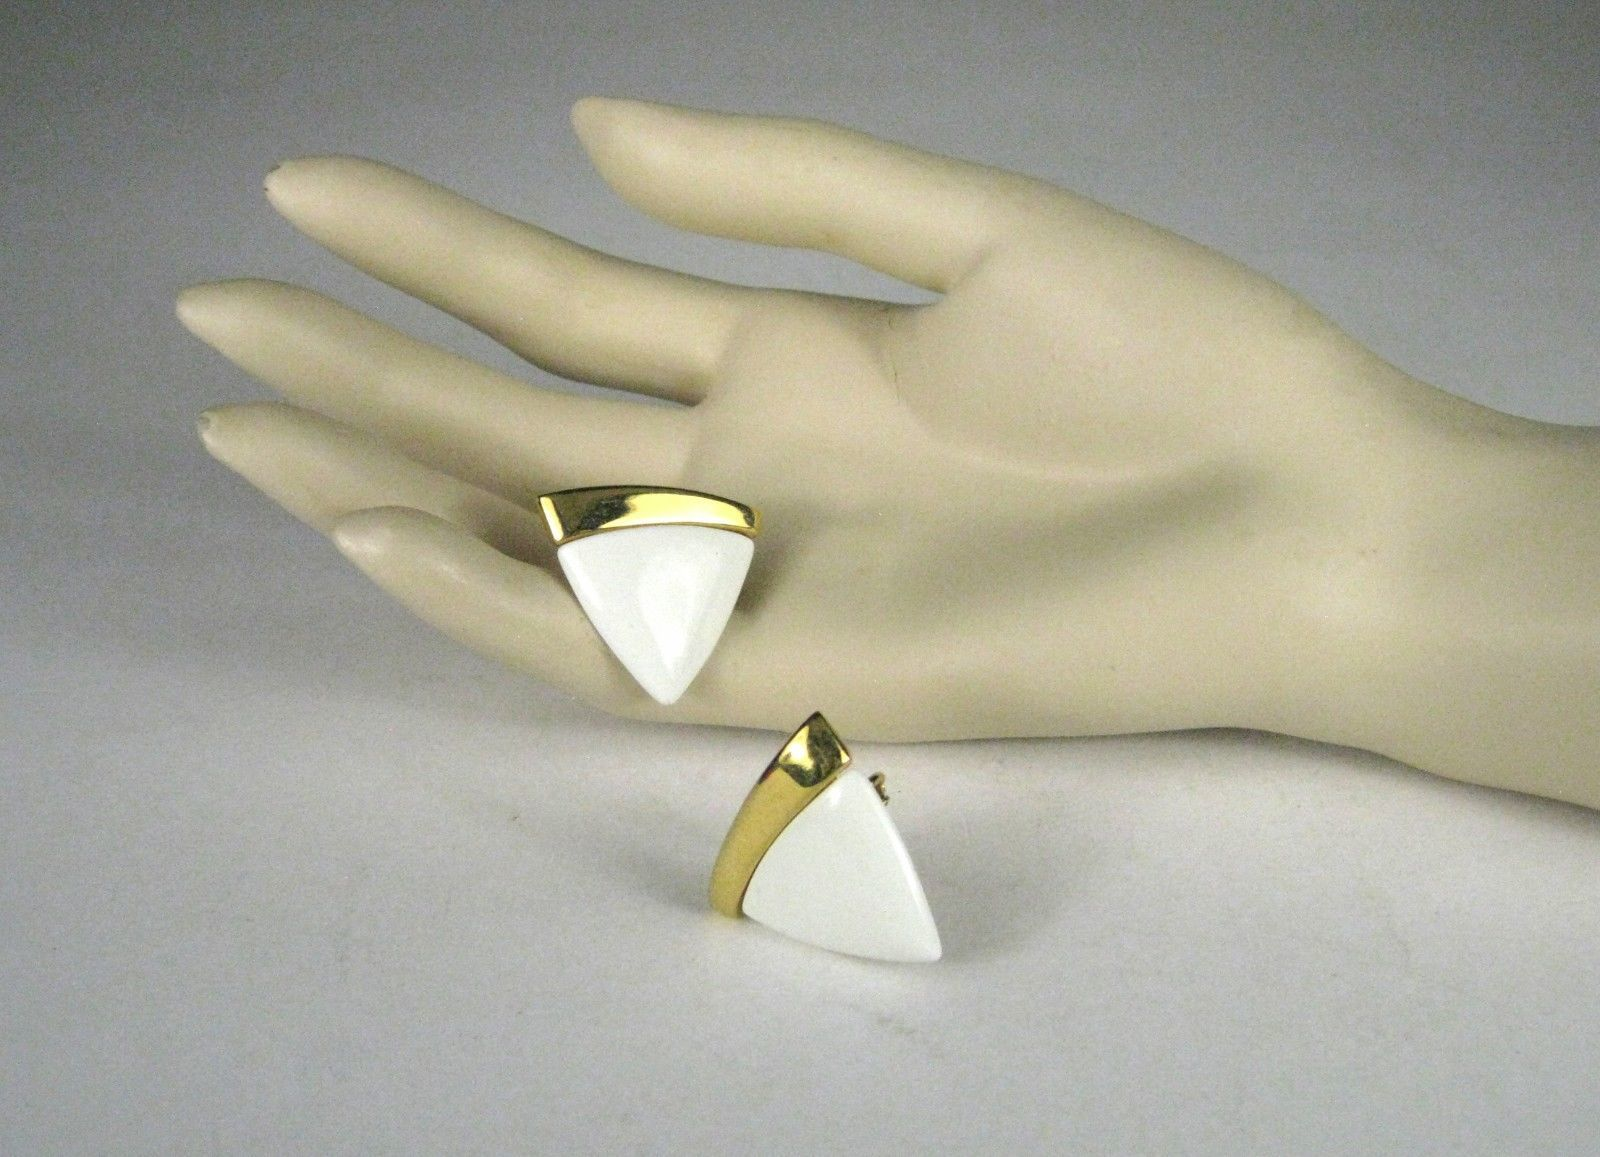 NAPIER Clip Earring Screw Back White Lucite Goldtone Signed VTG Vintage image 7